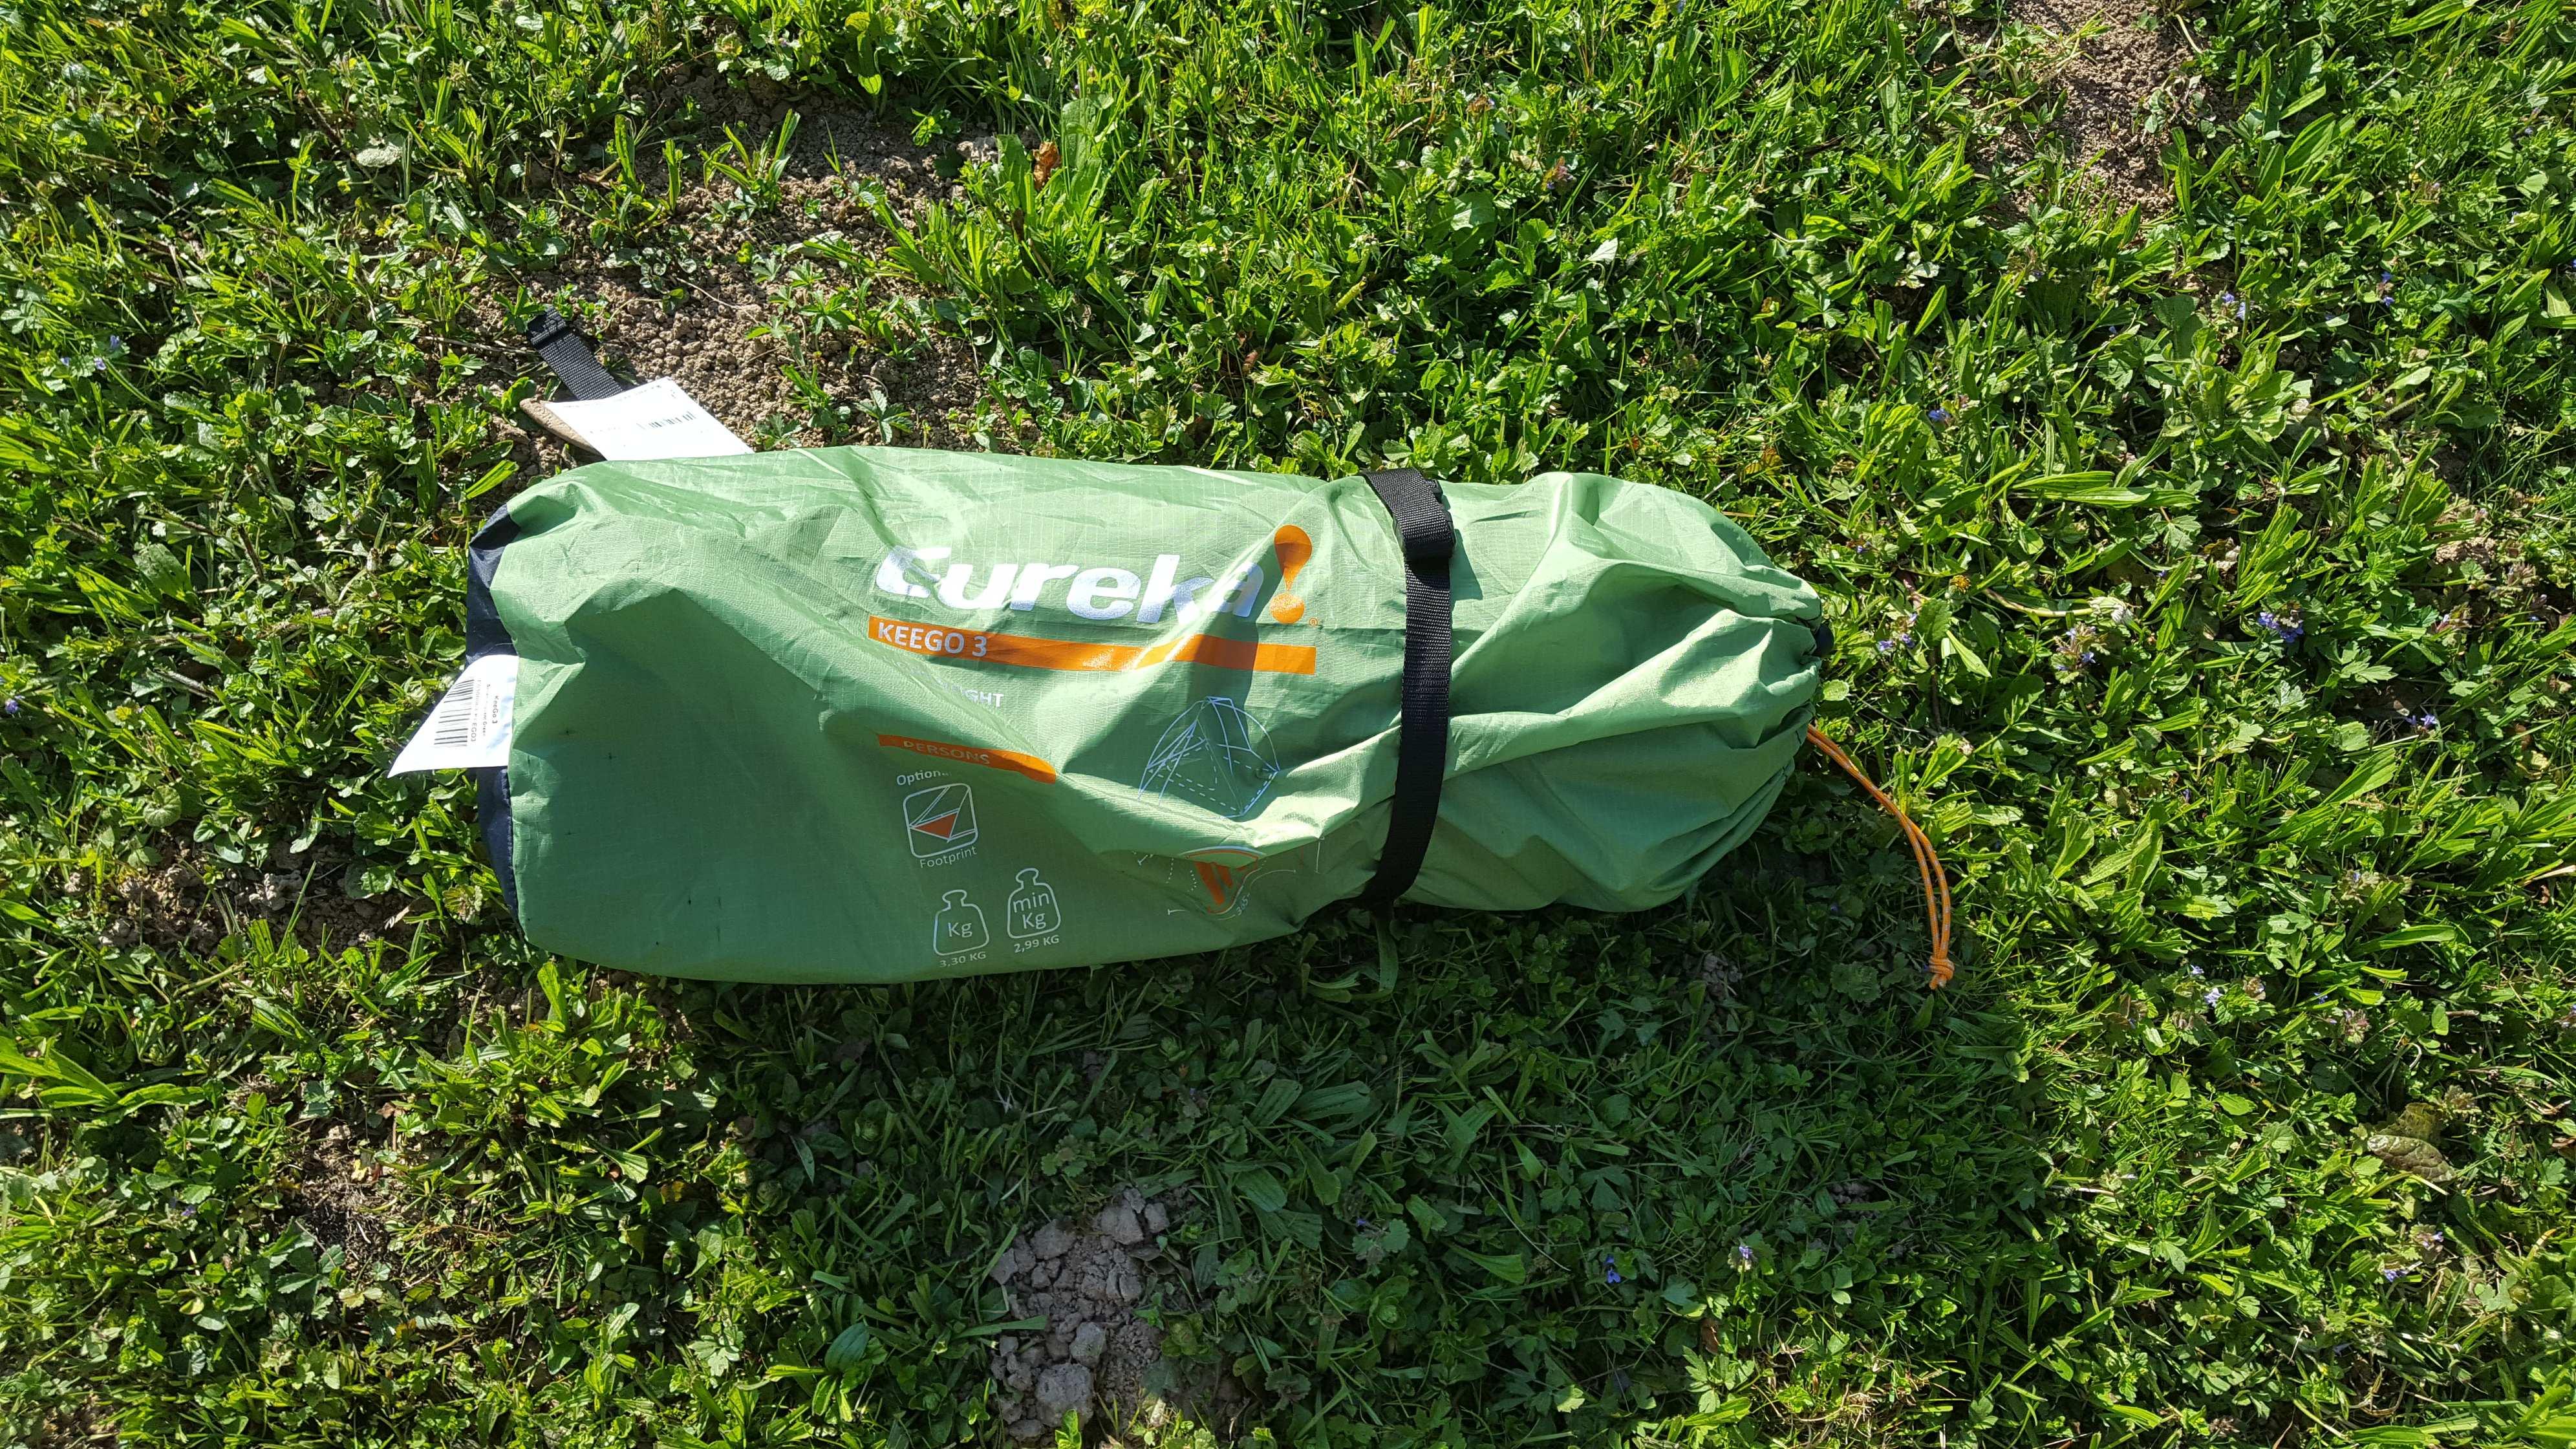 Das Eureka KeeGo 3 | Zelten, Motorrad